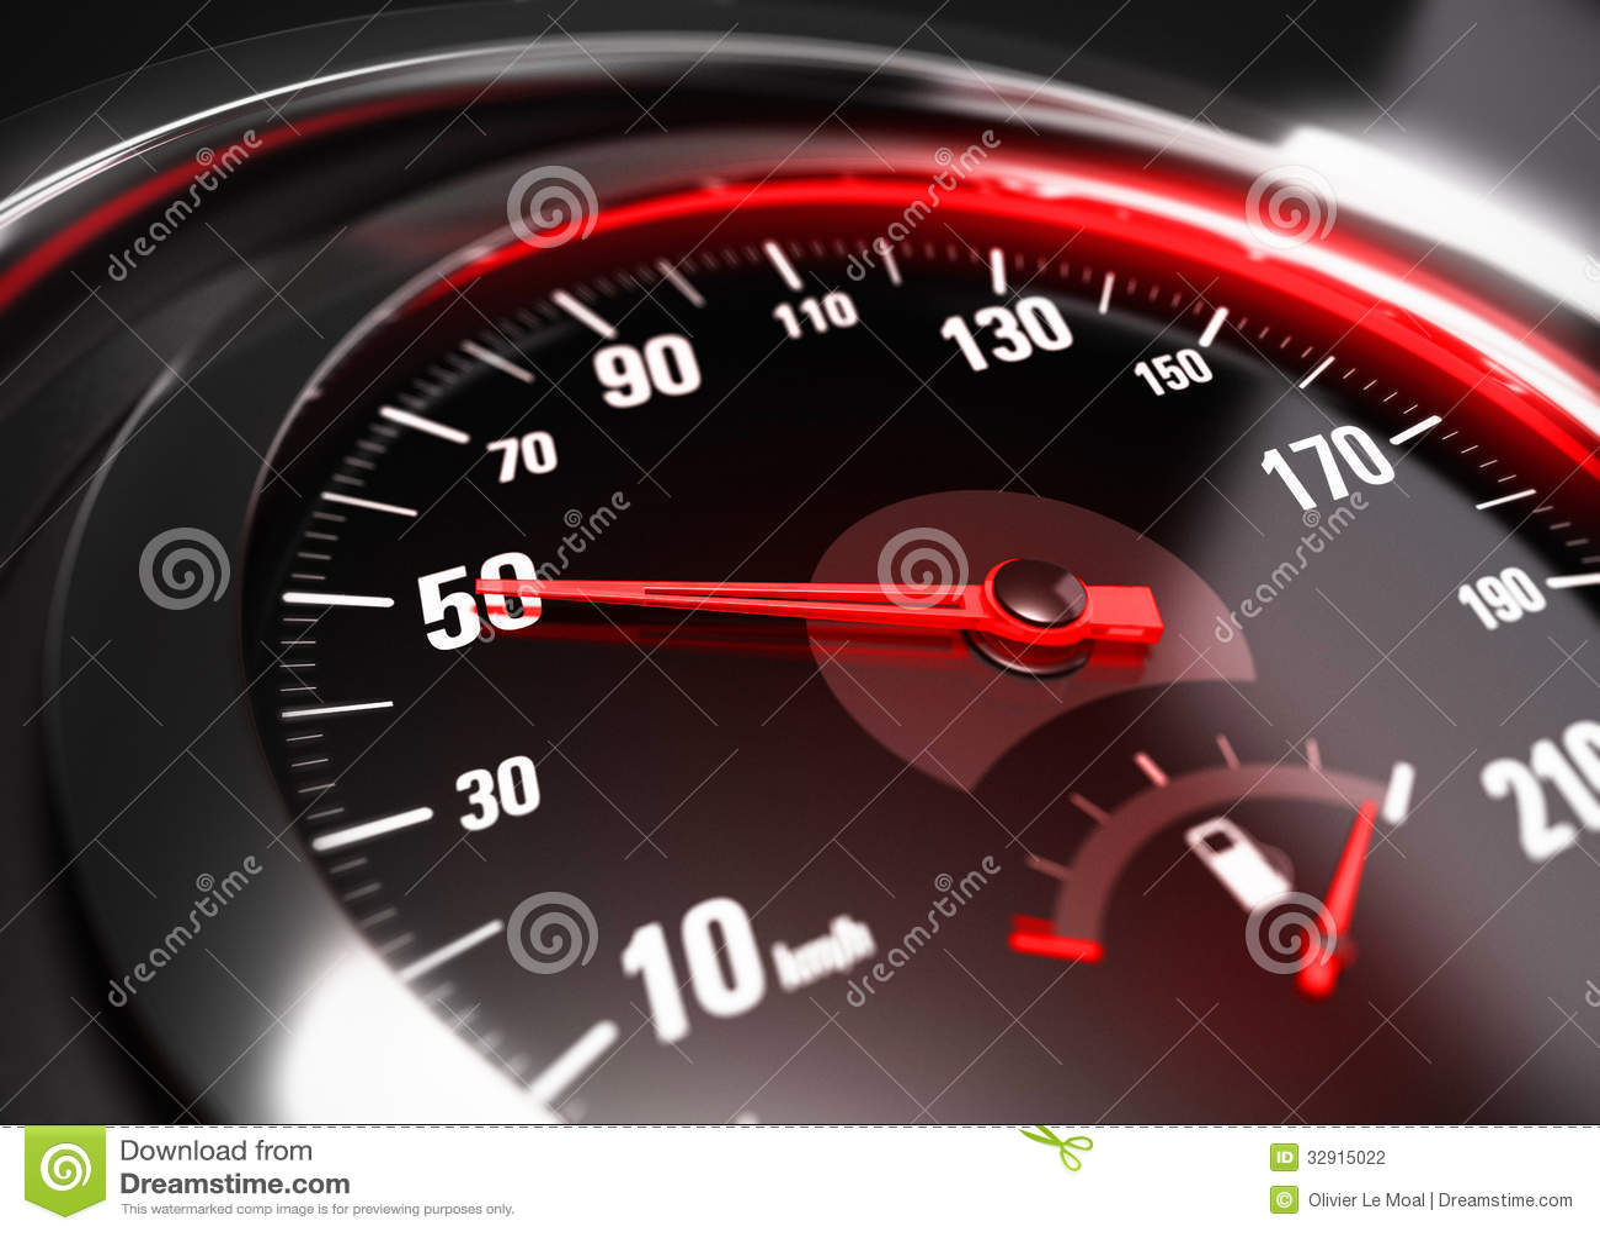 reducing speed safe driving concept 50 km h stock. Black Bedroom Furniture Sets. Home Design Ideas